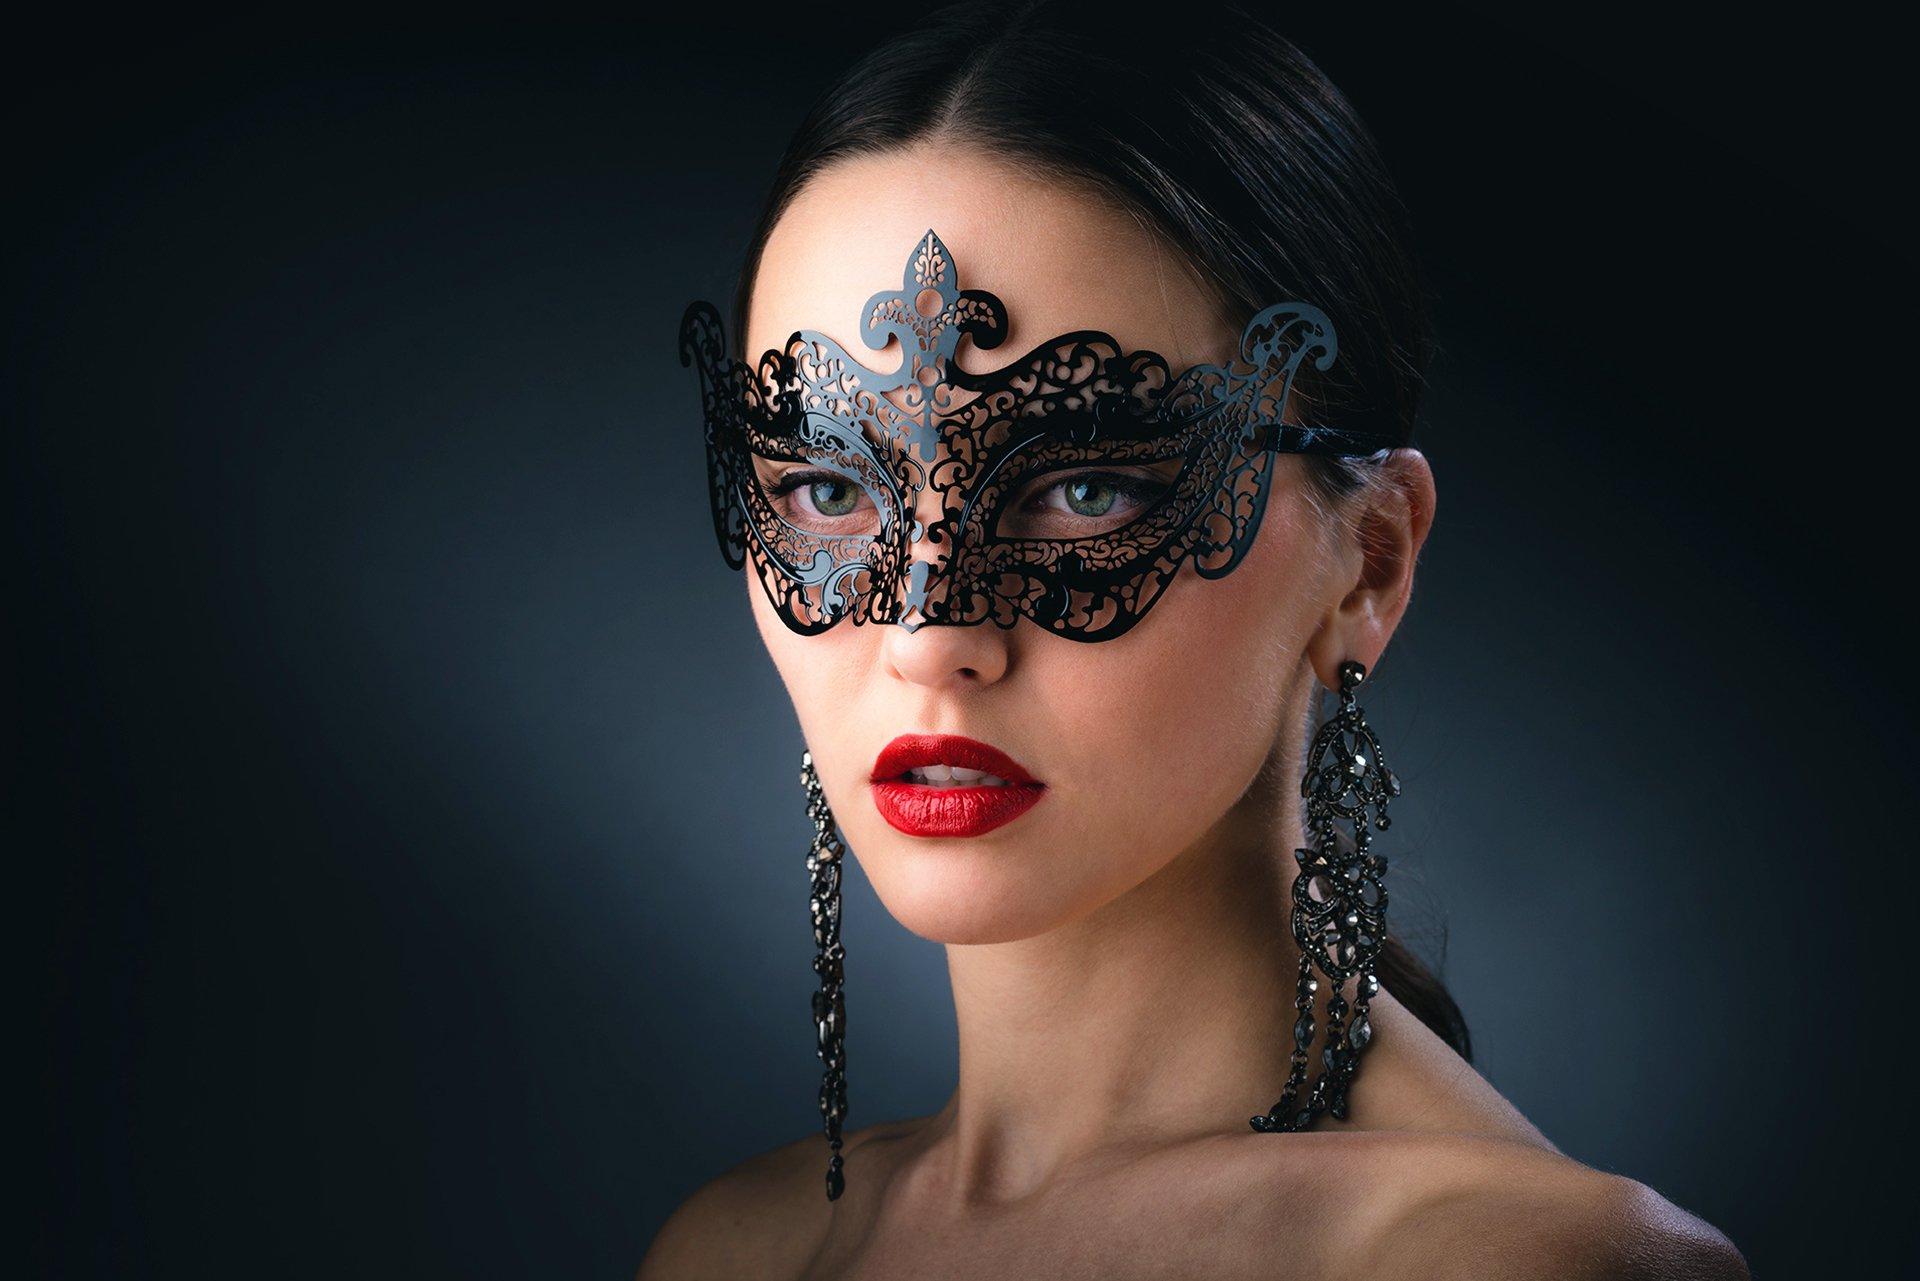 Photography - Mask  Green Eyes Brunette Woman Lipstick Earrings Face Stare Wallpaper